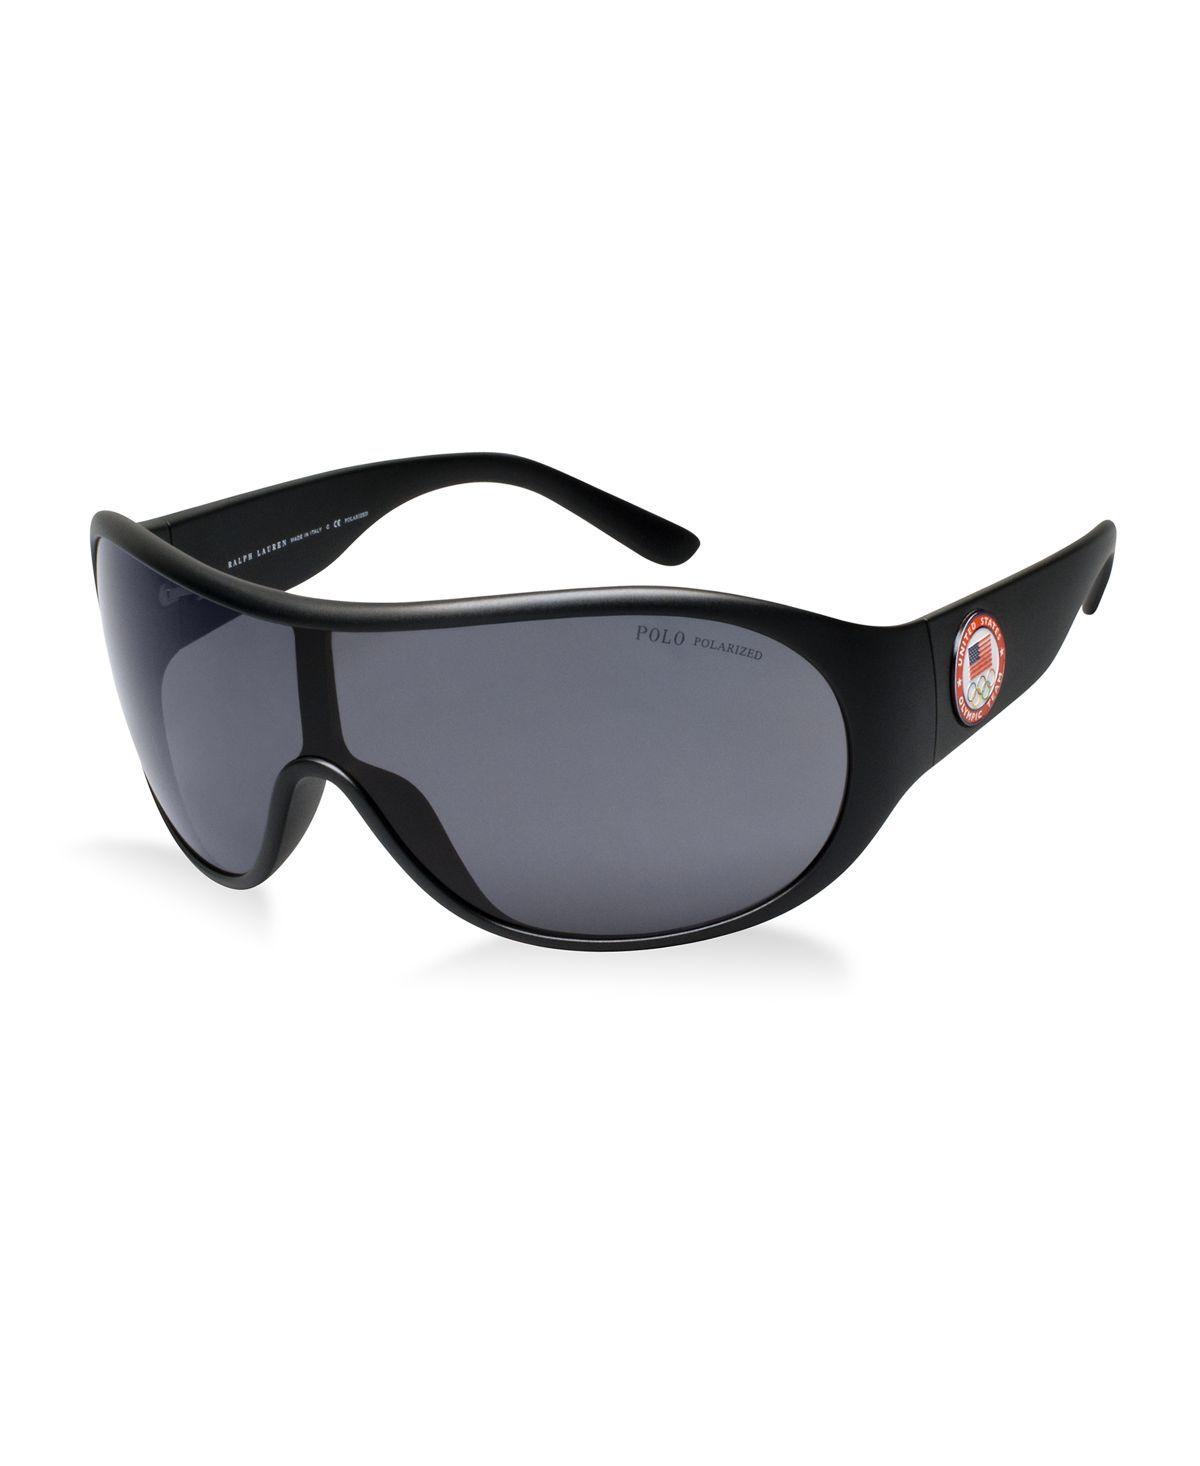 Ralph Polo Lauren SunglassesPh4067Sunglasses Polo Ralph Ralph Lauren Polo Lauren Ralph Polo SunglassesPh4067Sunglasses SunglassesPh4067Sunglasses xrCBedoW